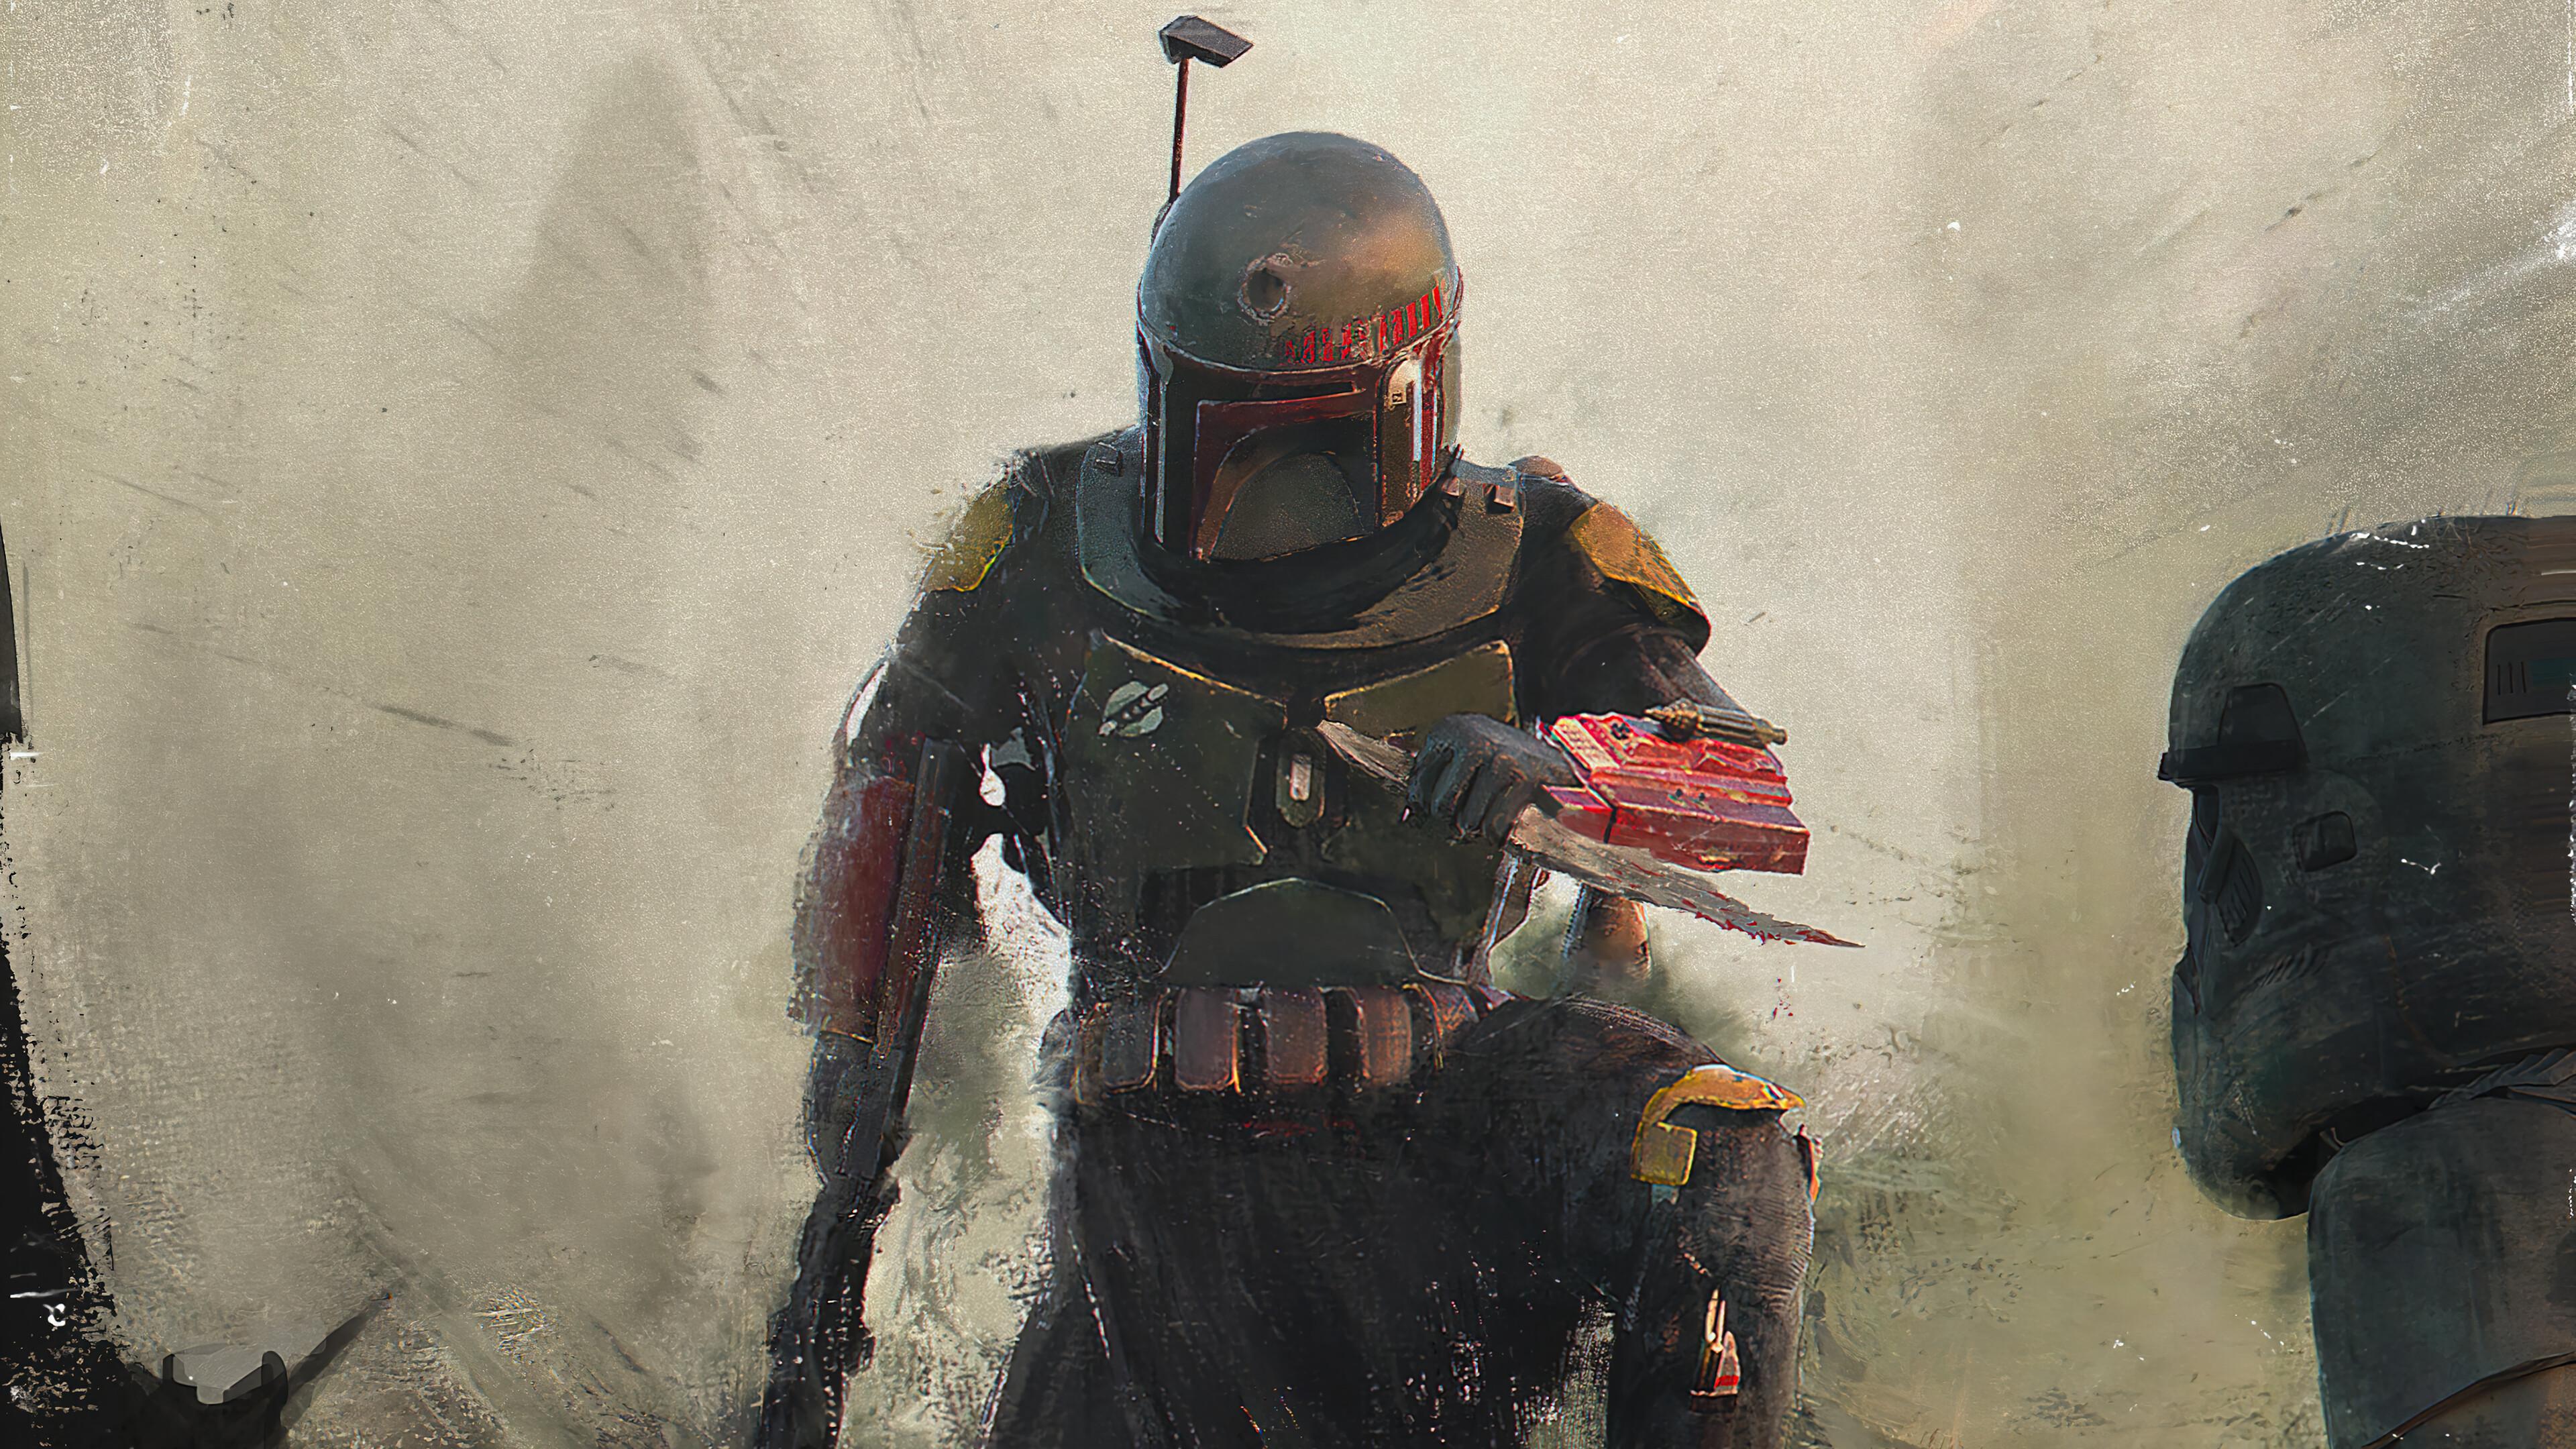 Boba Fett Star Wars 3840x2160